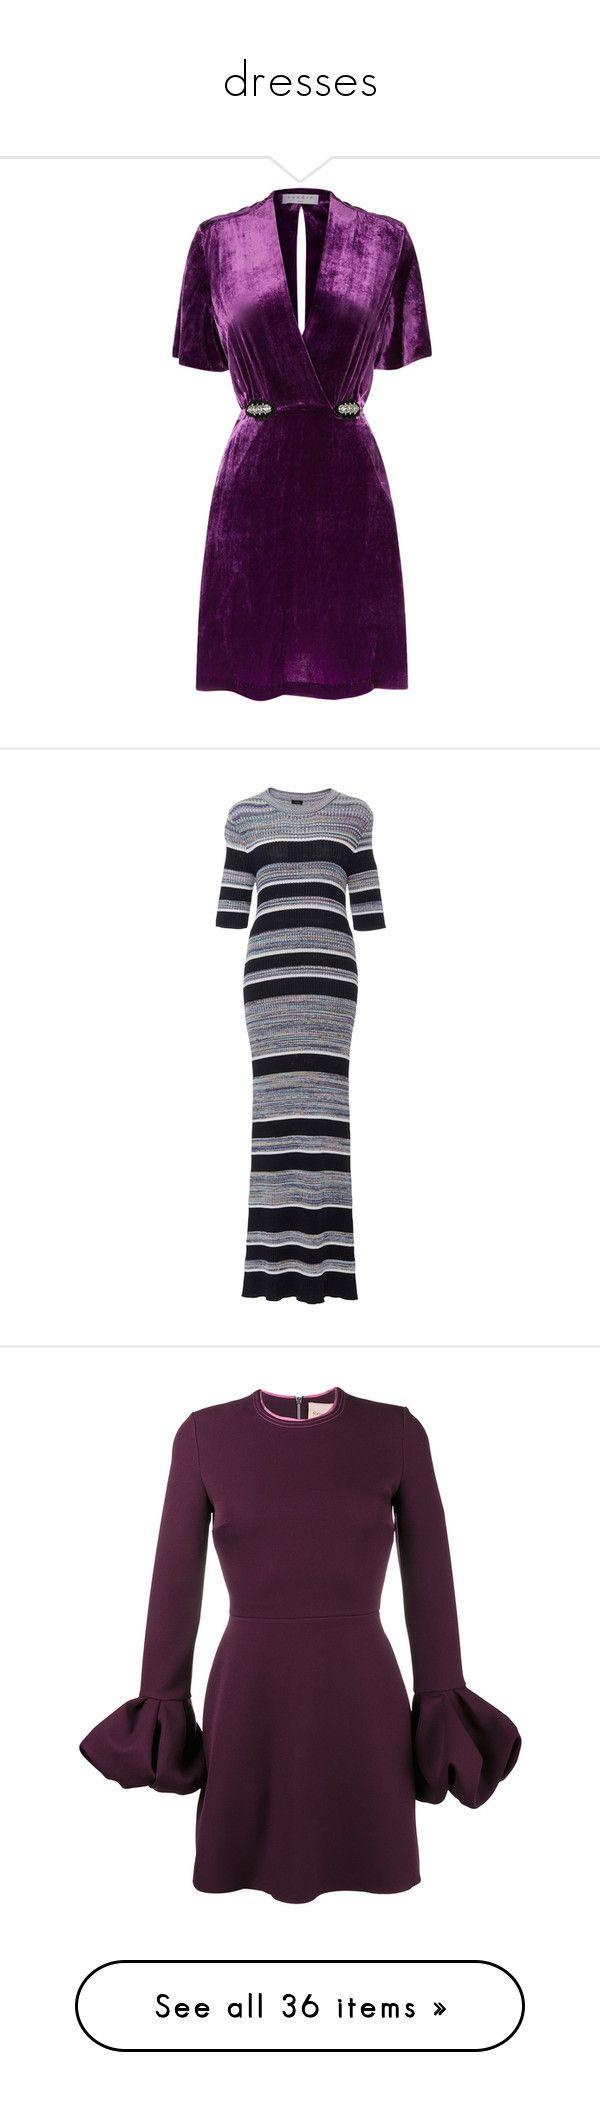 """dresses"" by sassysuzyq ❤ liked on Polyvore featuring dresses, short dresses, sparkly mini dress, sparkly dresses, short velvet dress, purple dresses, velvet mini dress, stripe, form fitting dresses and striped dresses"